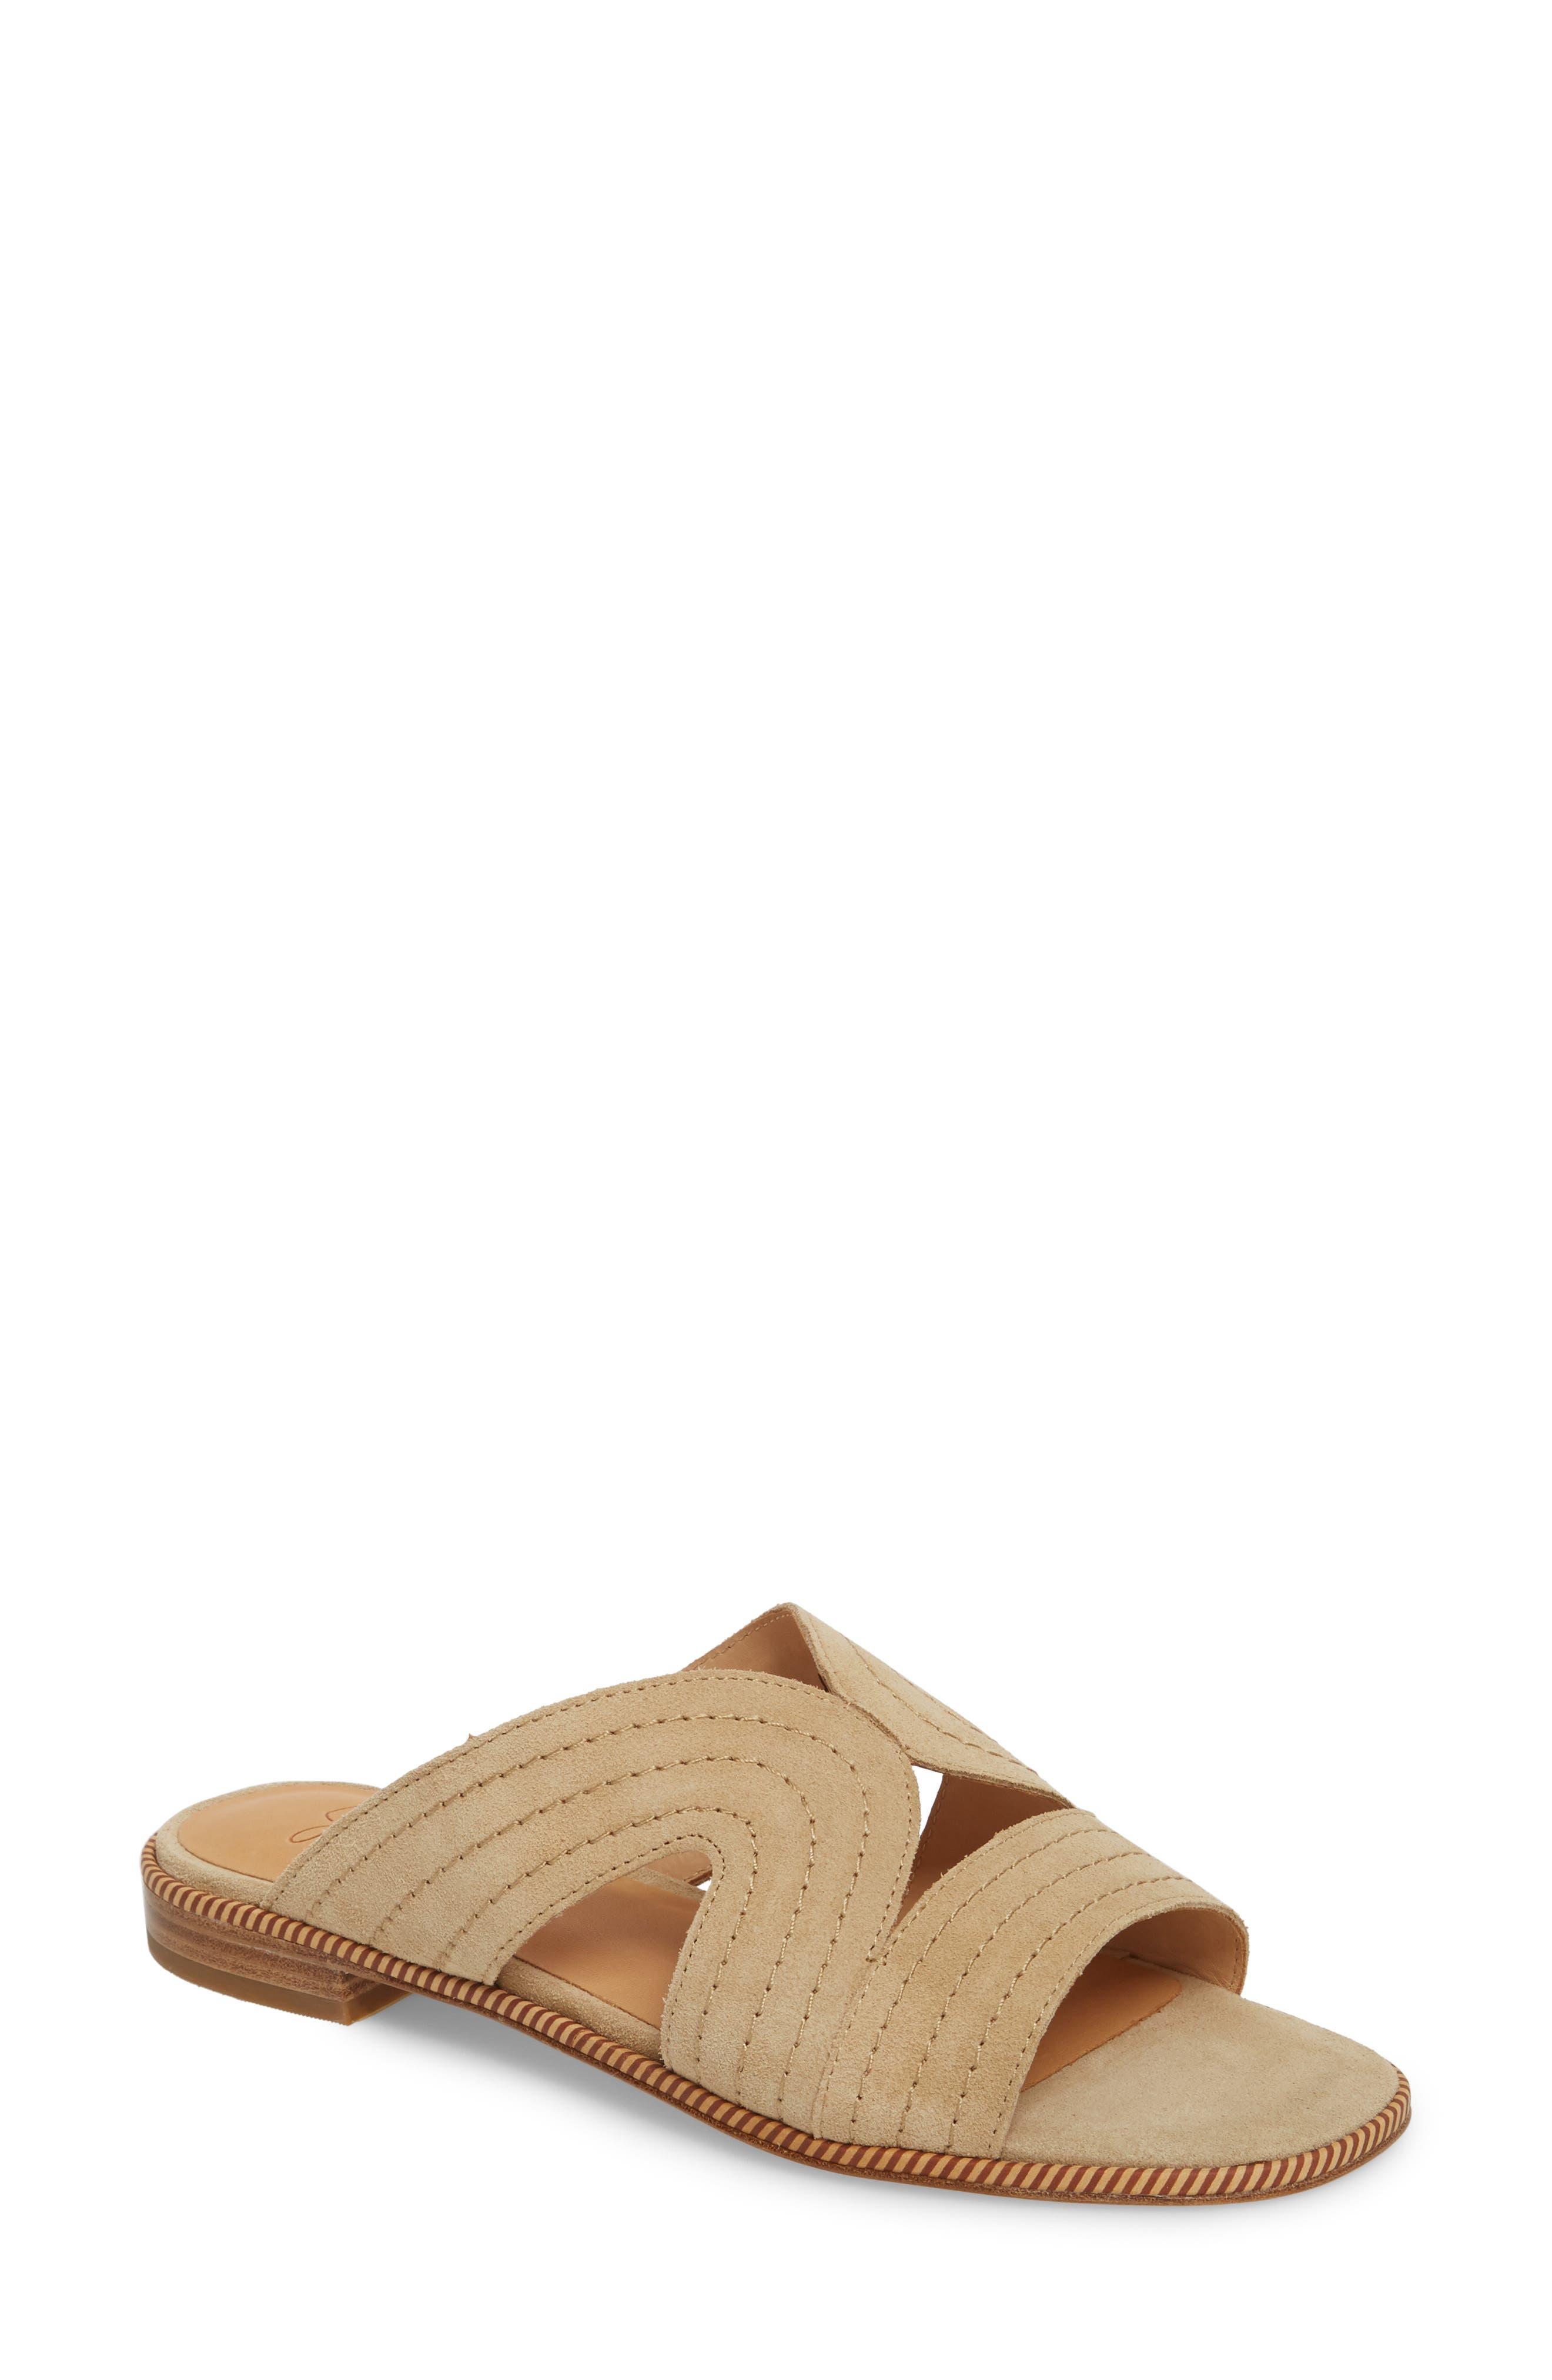 Paetyn Slide Sandal,                         Main,                         color, 250